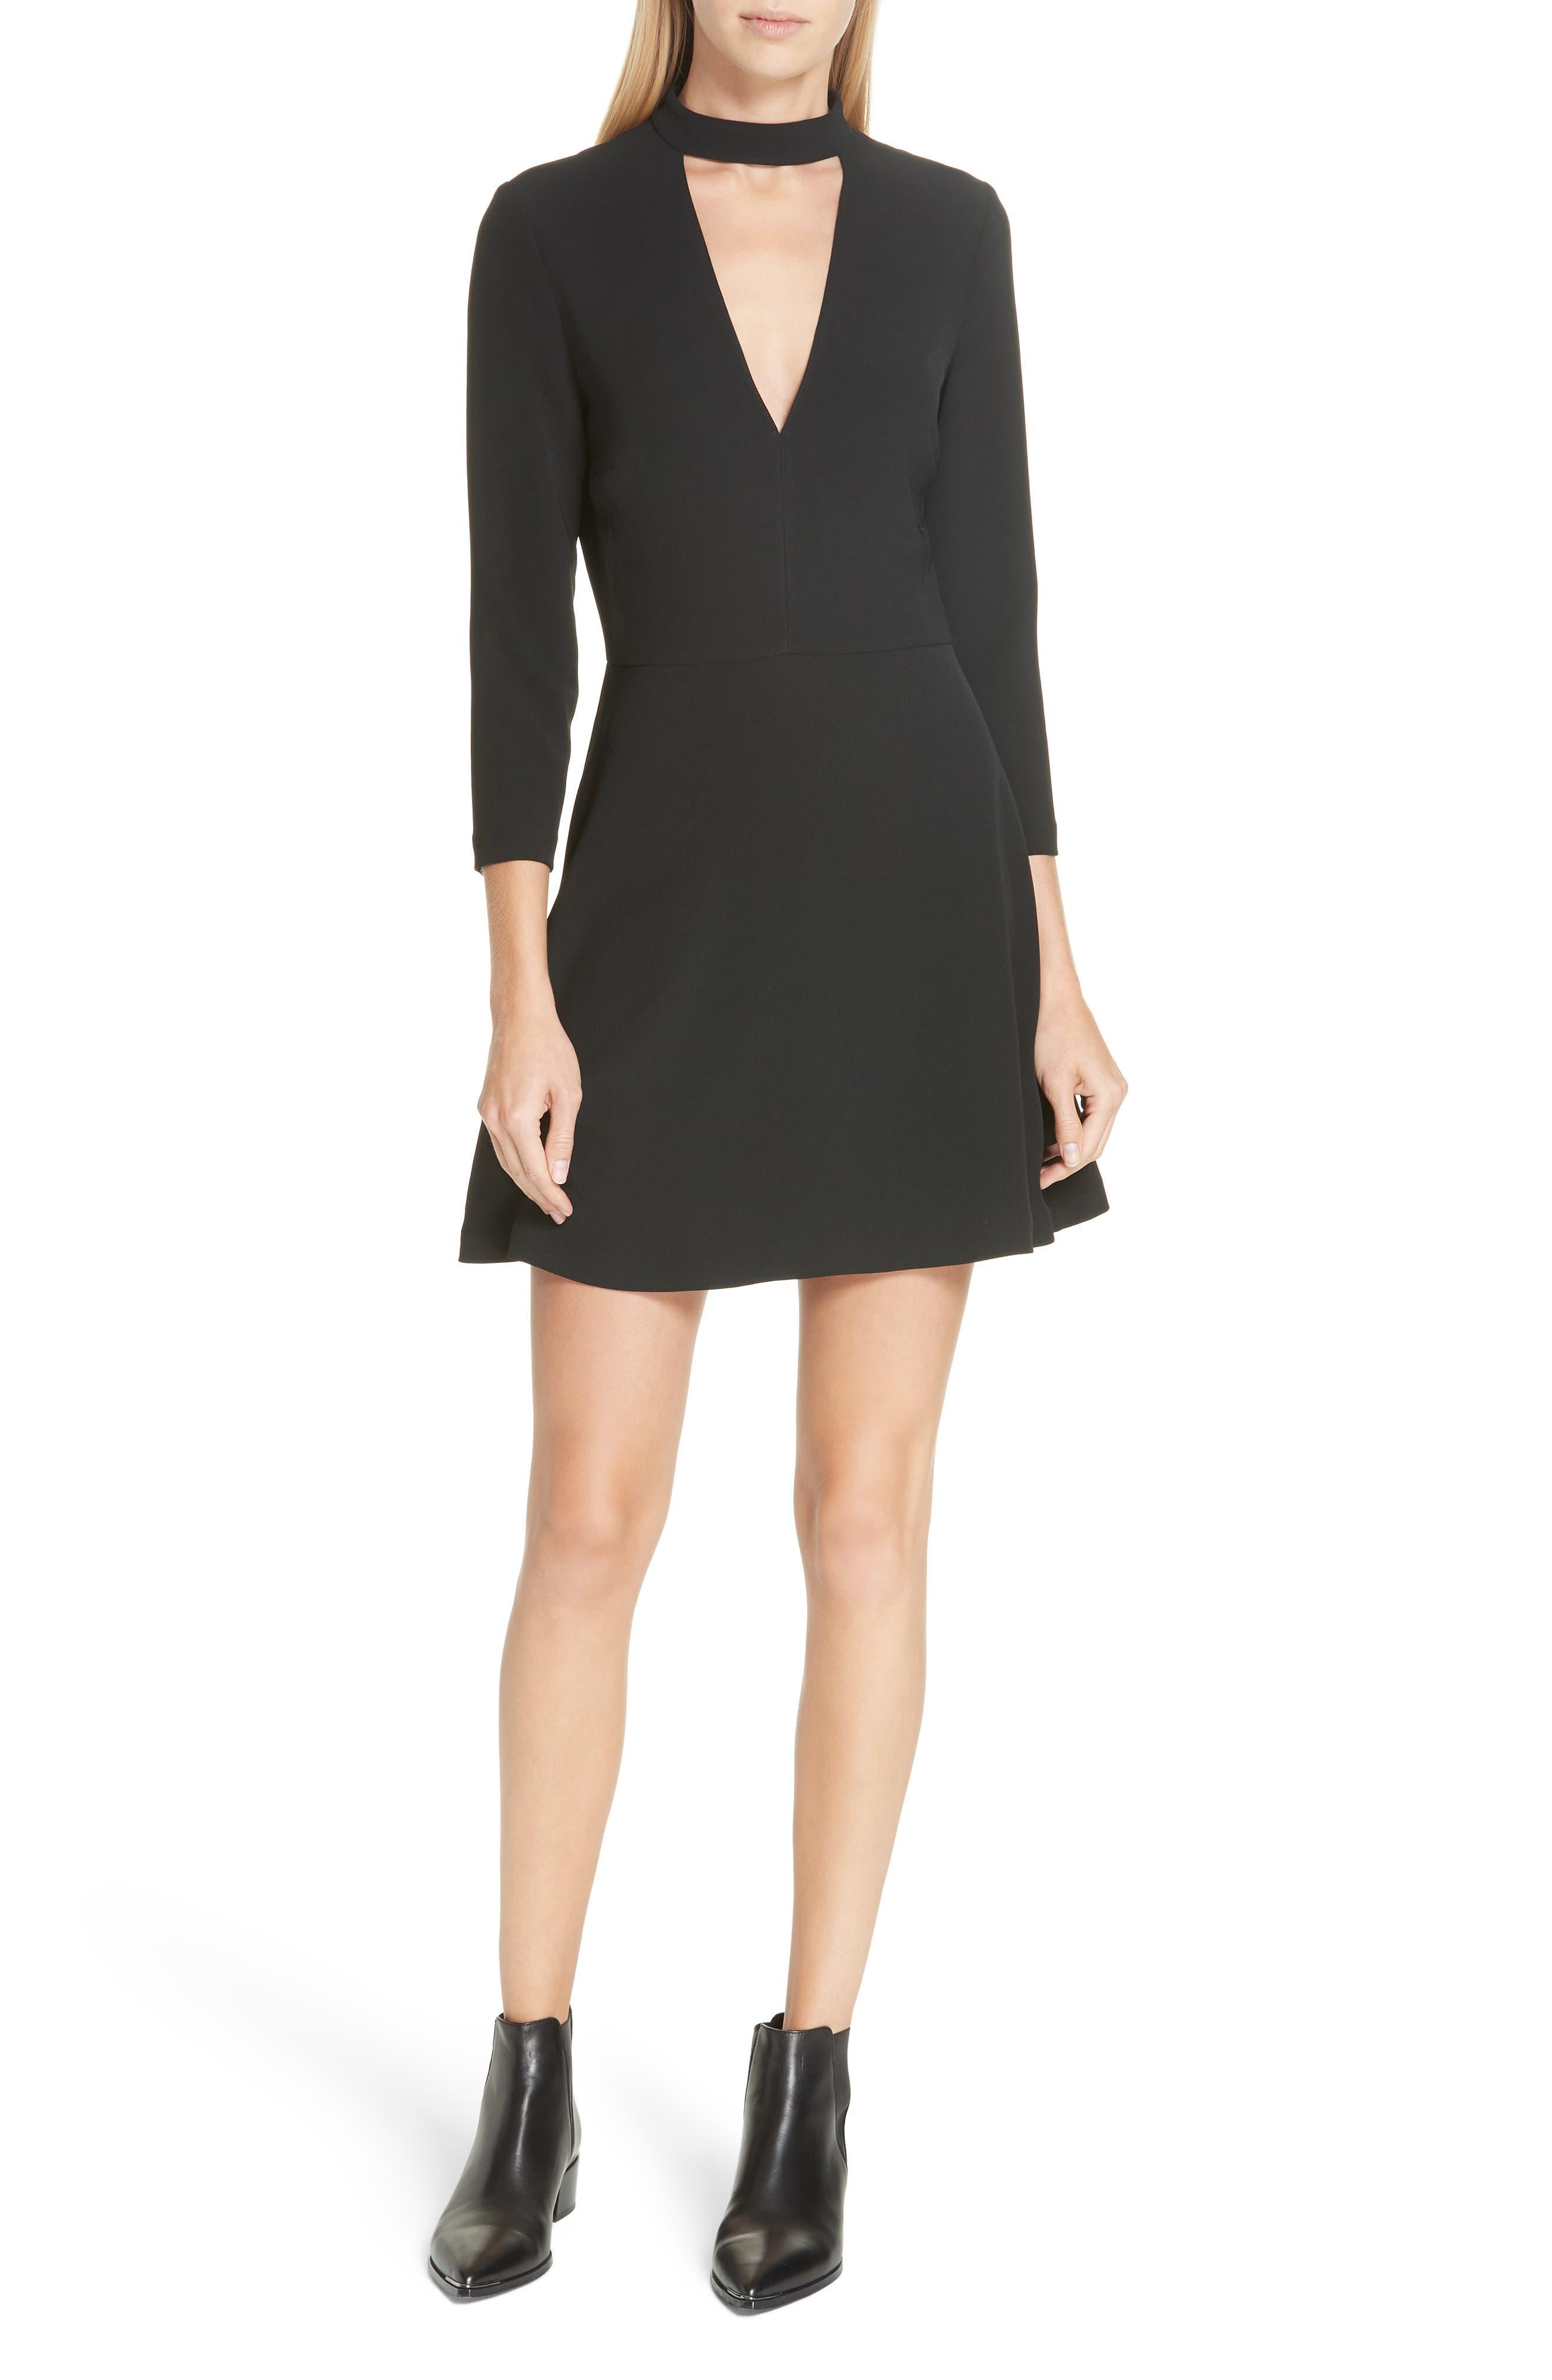 A.l.c. Lee Cutout Dress